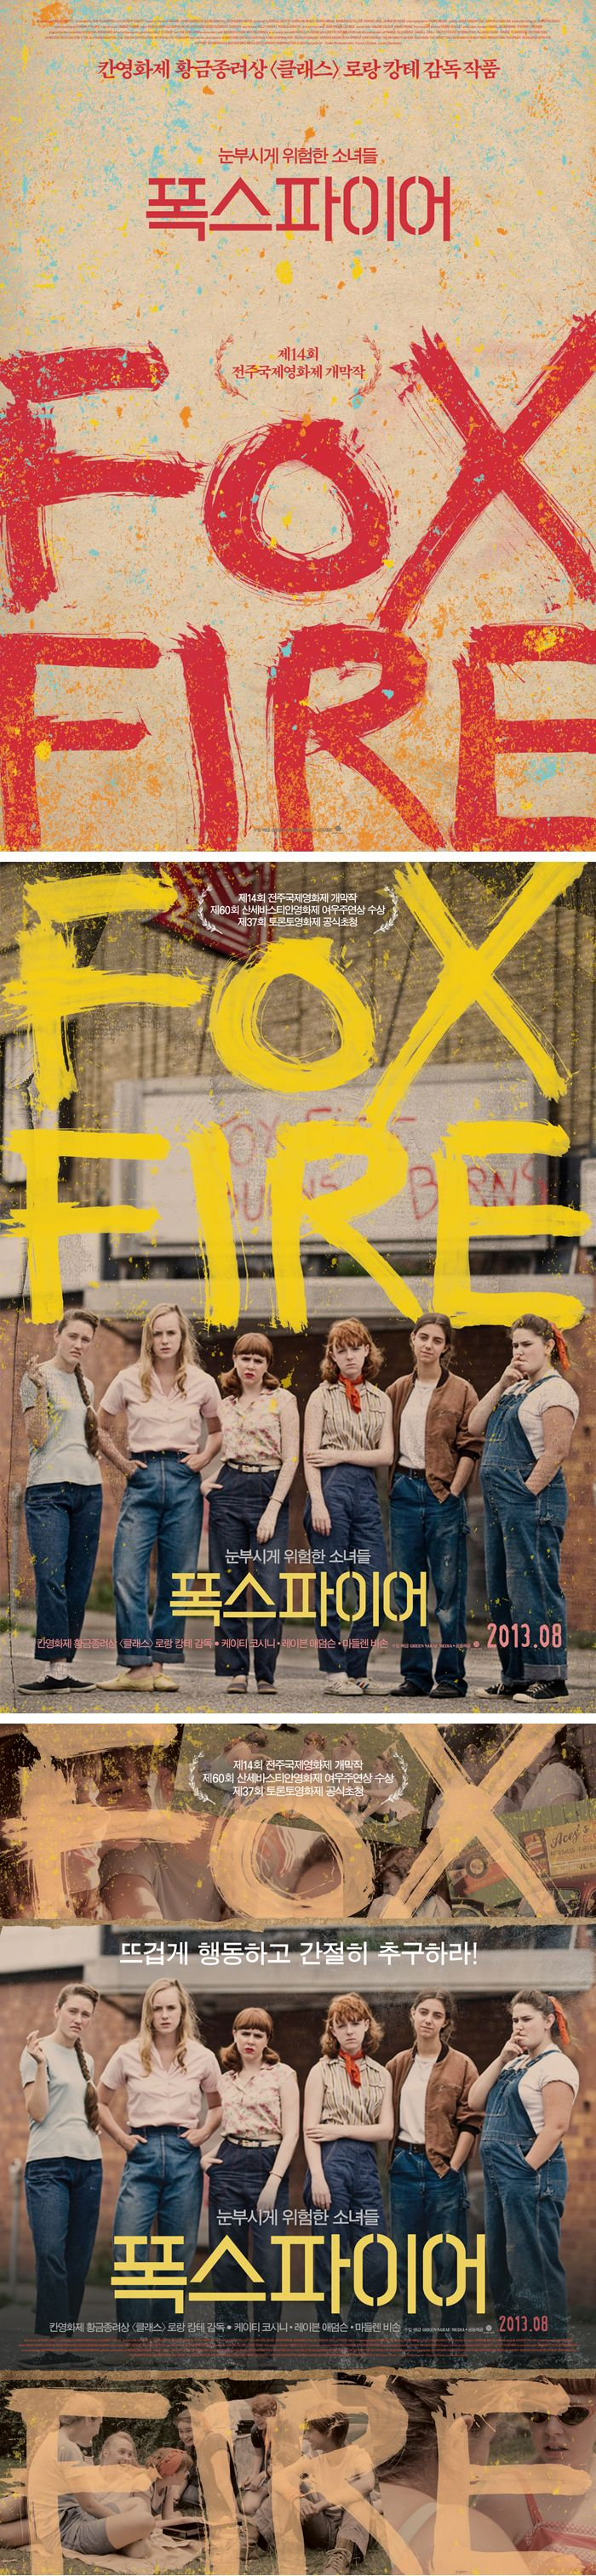 Film :: alternative graphics - PROPAGANDA :: - 폭스파이어 Foxfire